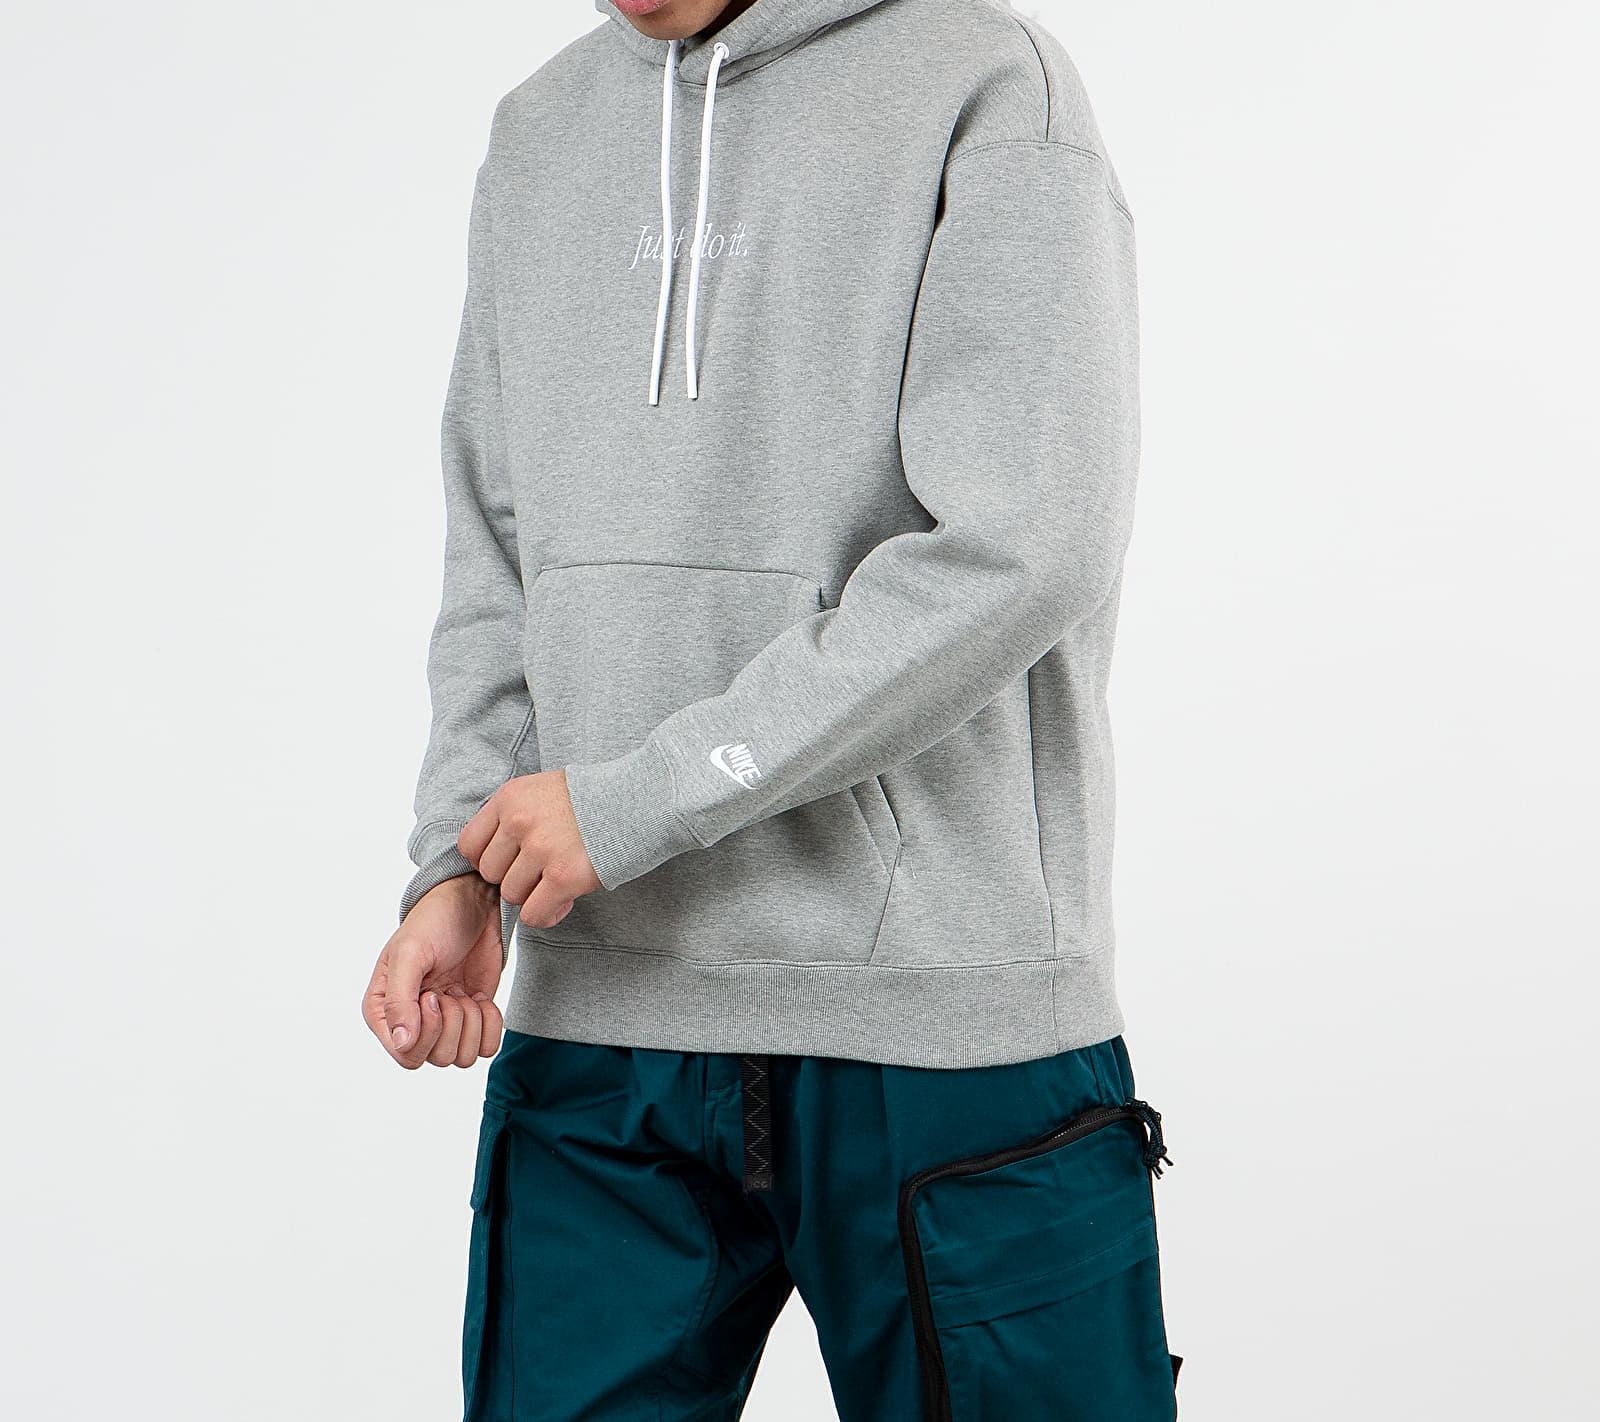 Nike Sportswear Just Do It Pullover Fleece Heavyweight Hoodie Dark Grey Heather/ White, Gray